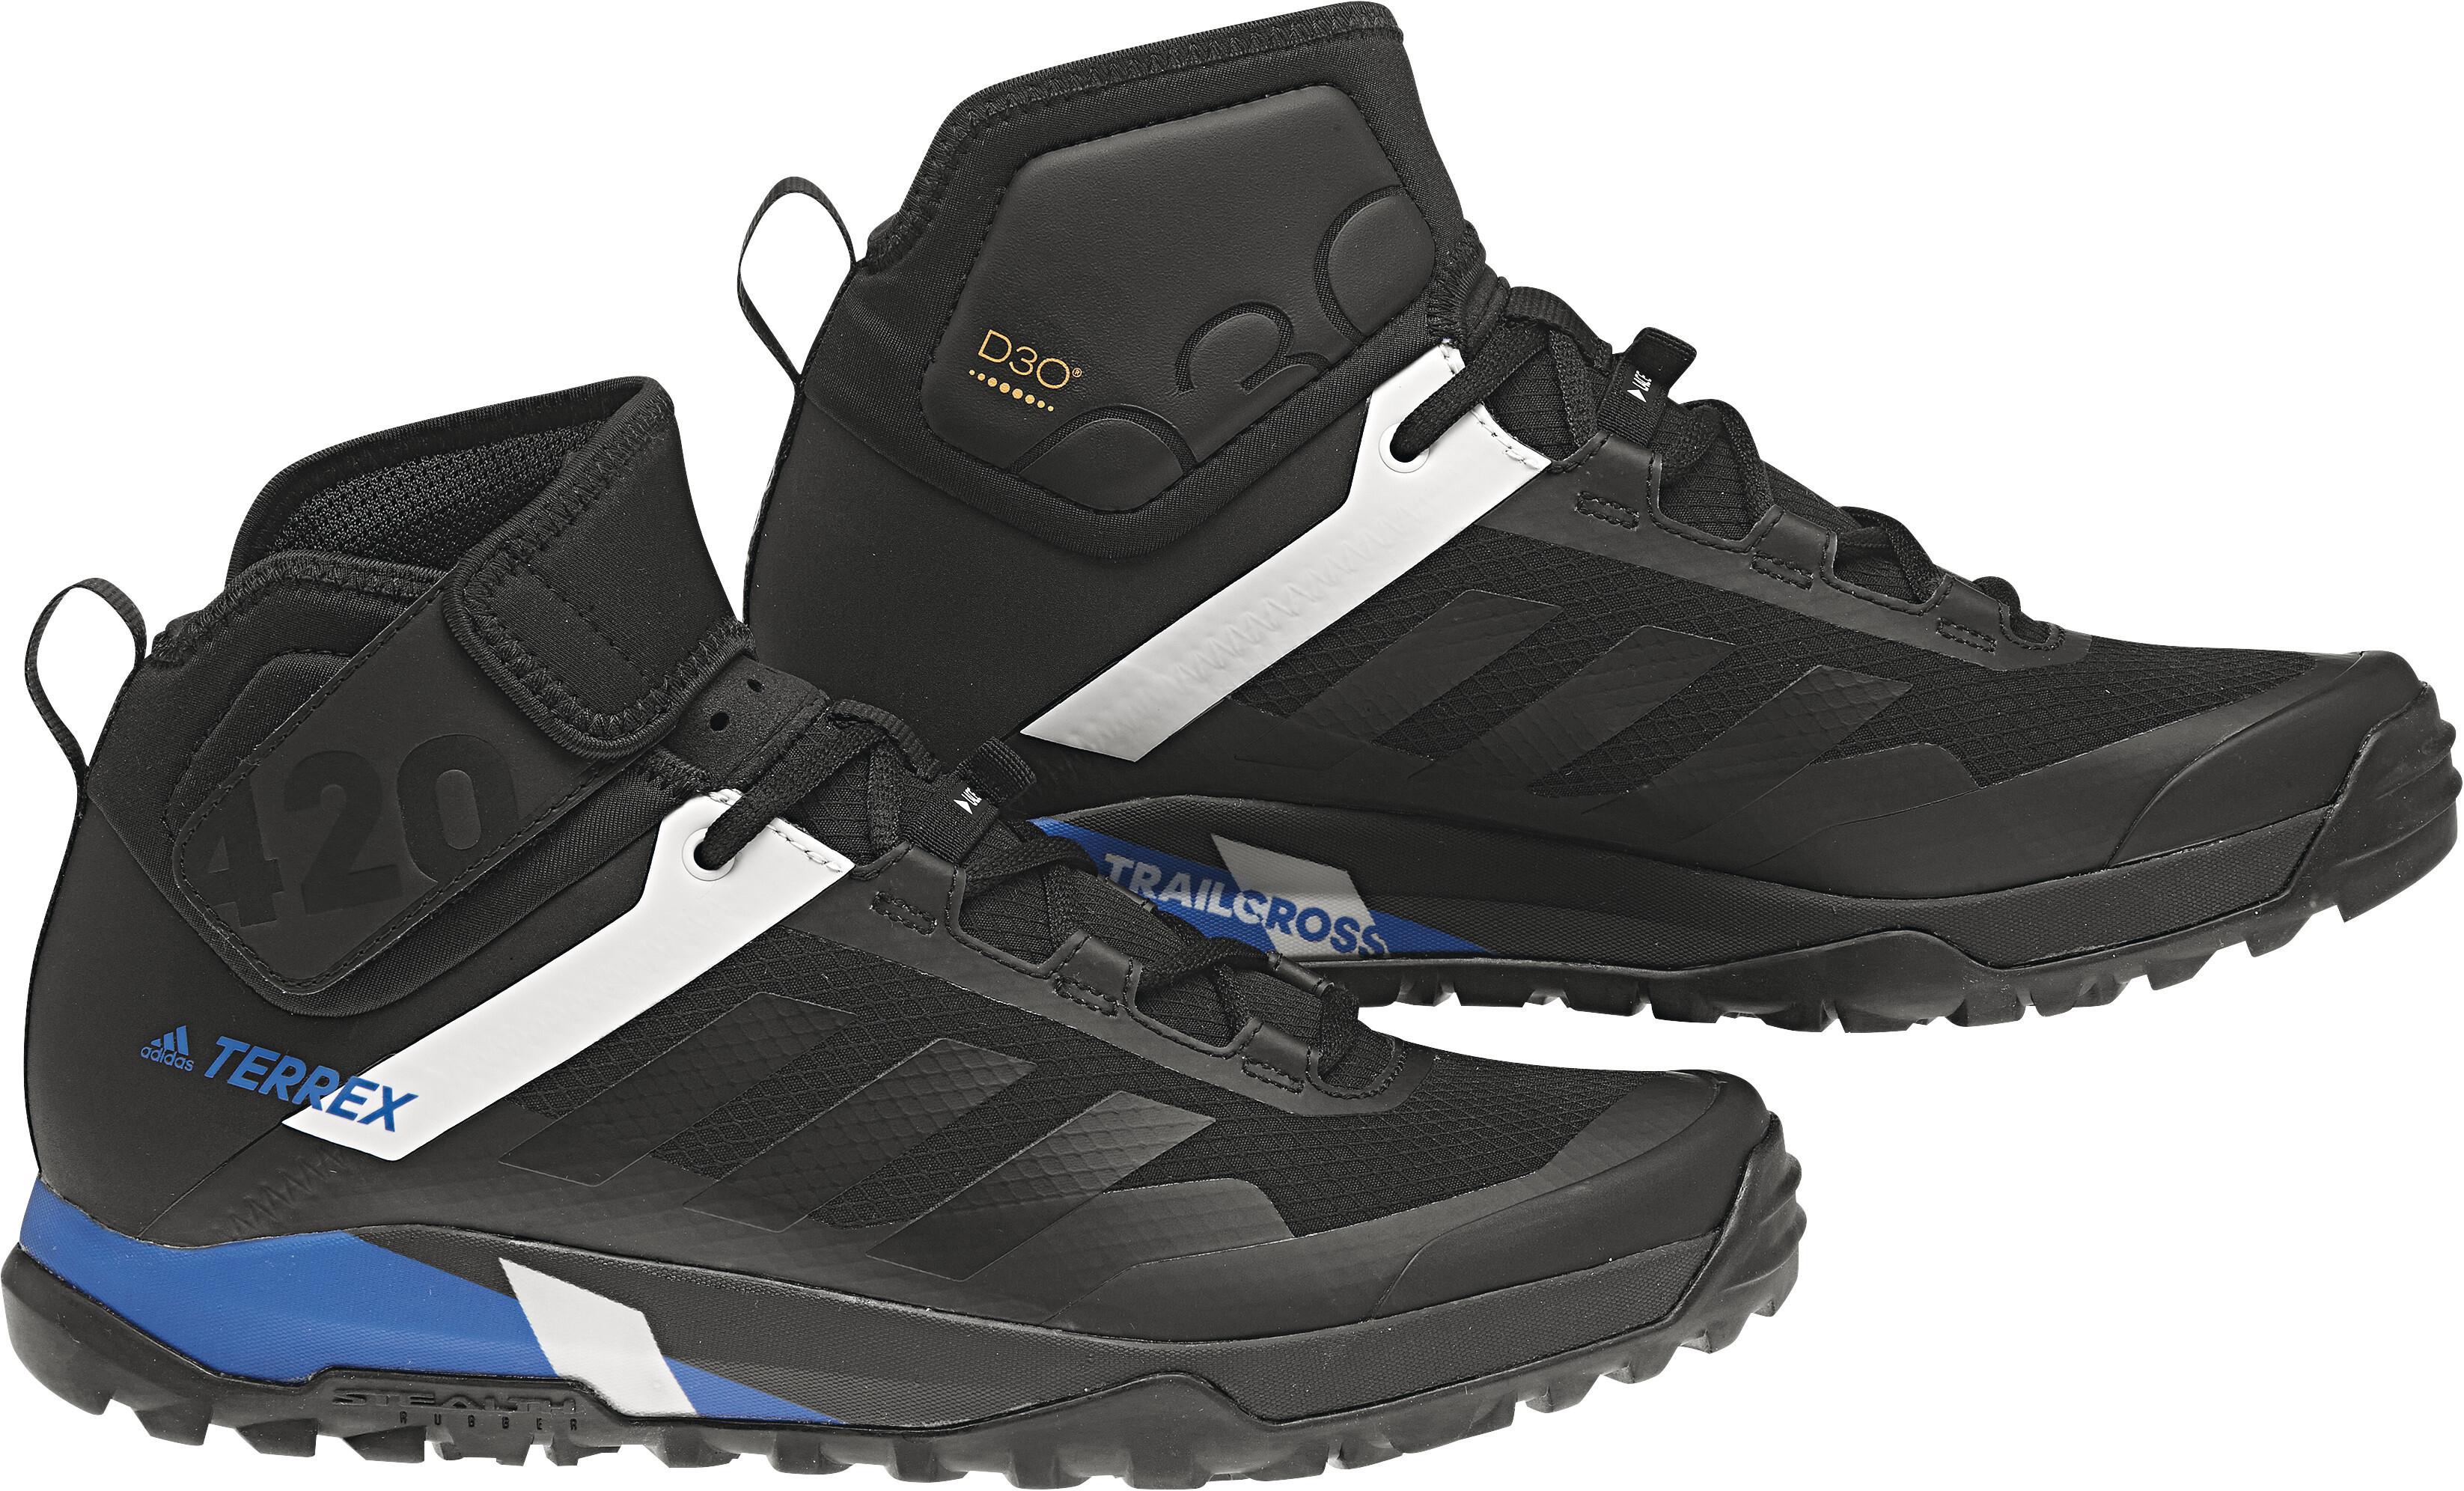 1926a981edf adidas TERREX Trail Cross Protect Shoes Men blue beauty/core  black/collegiate navy